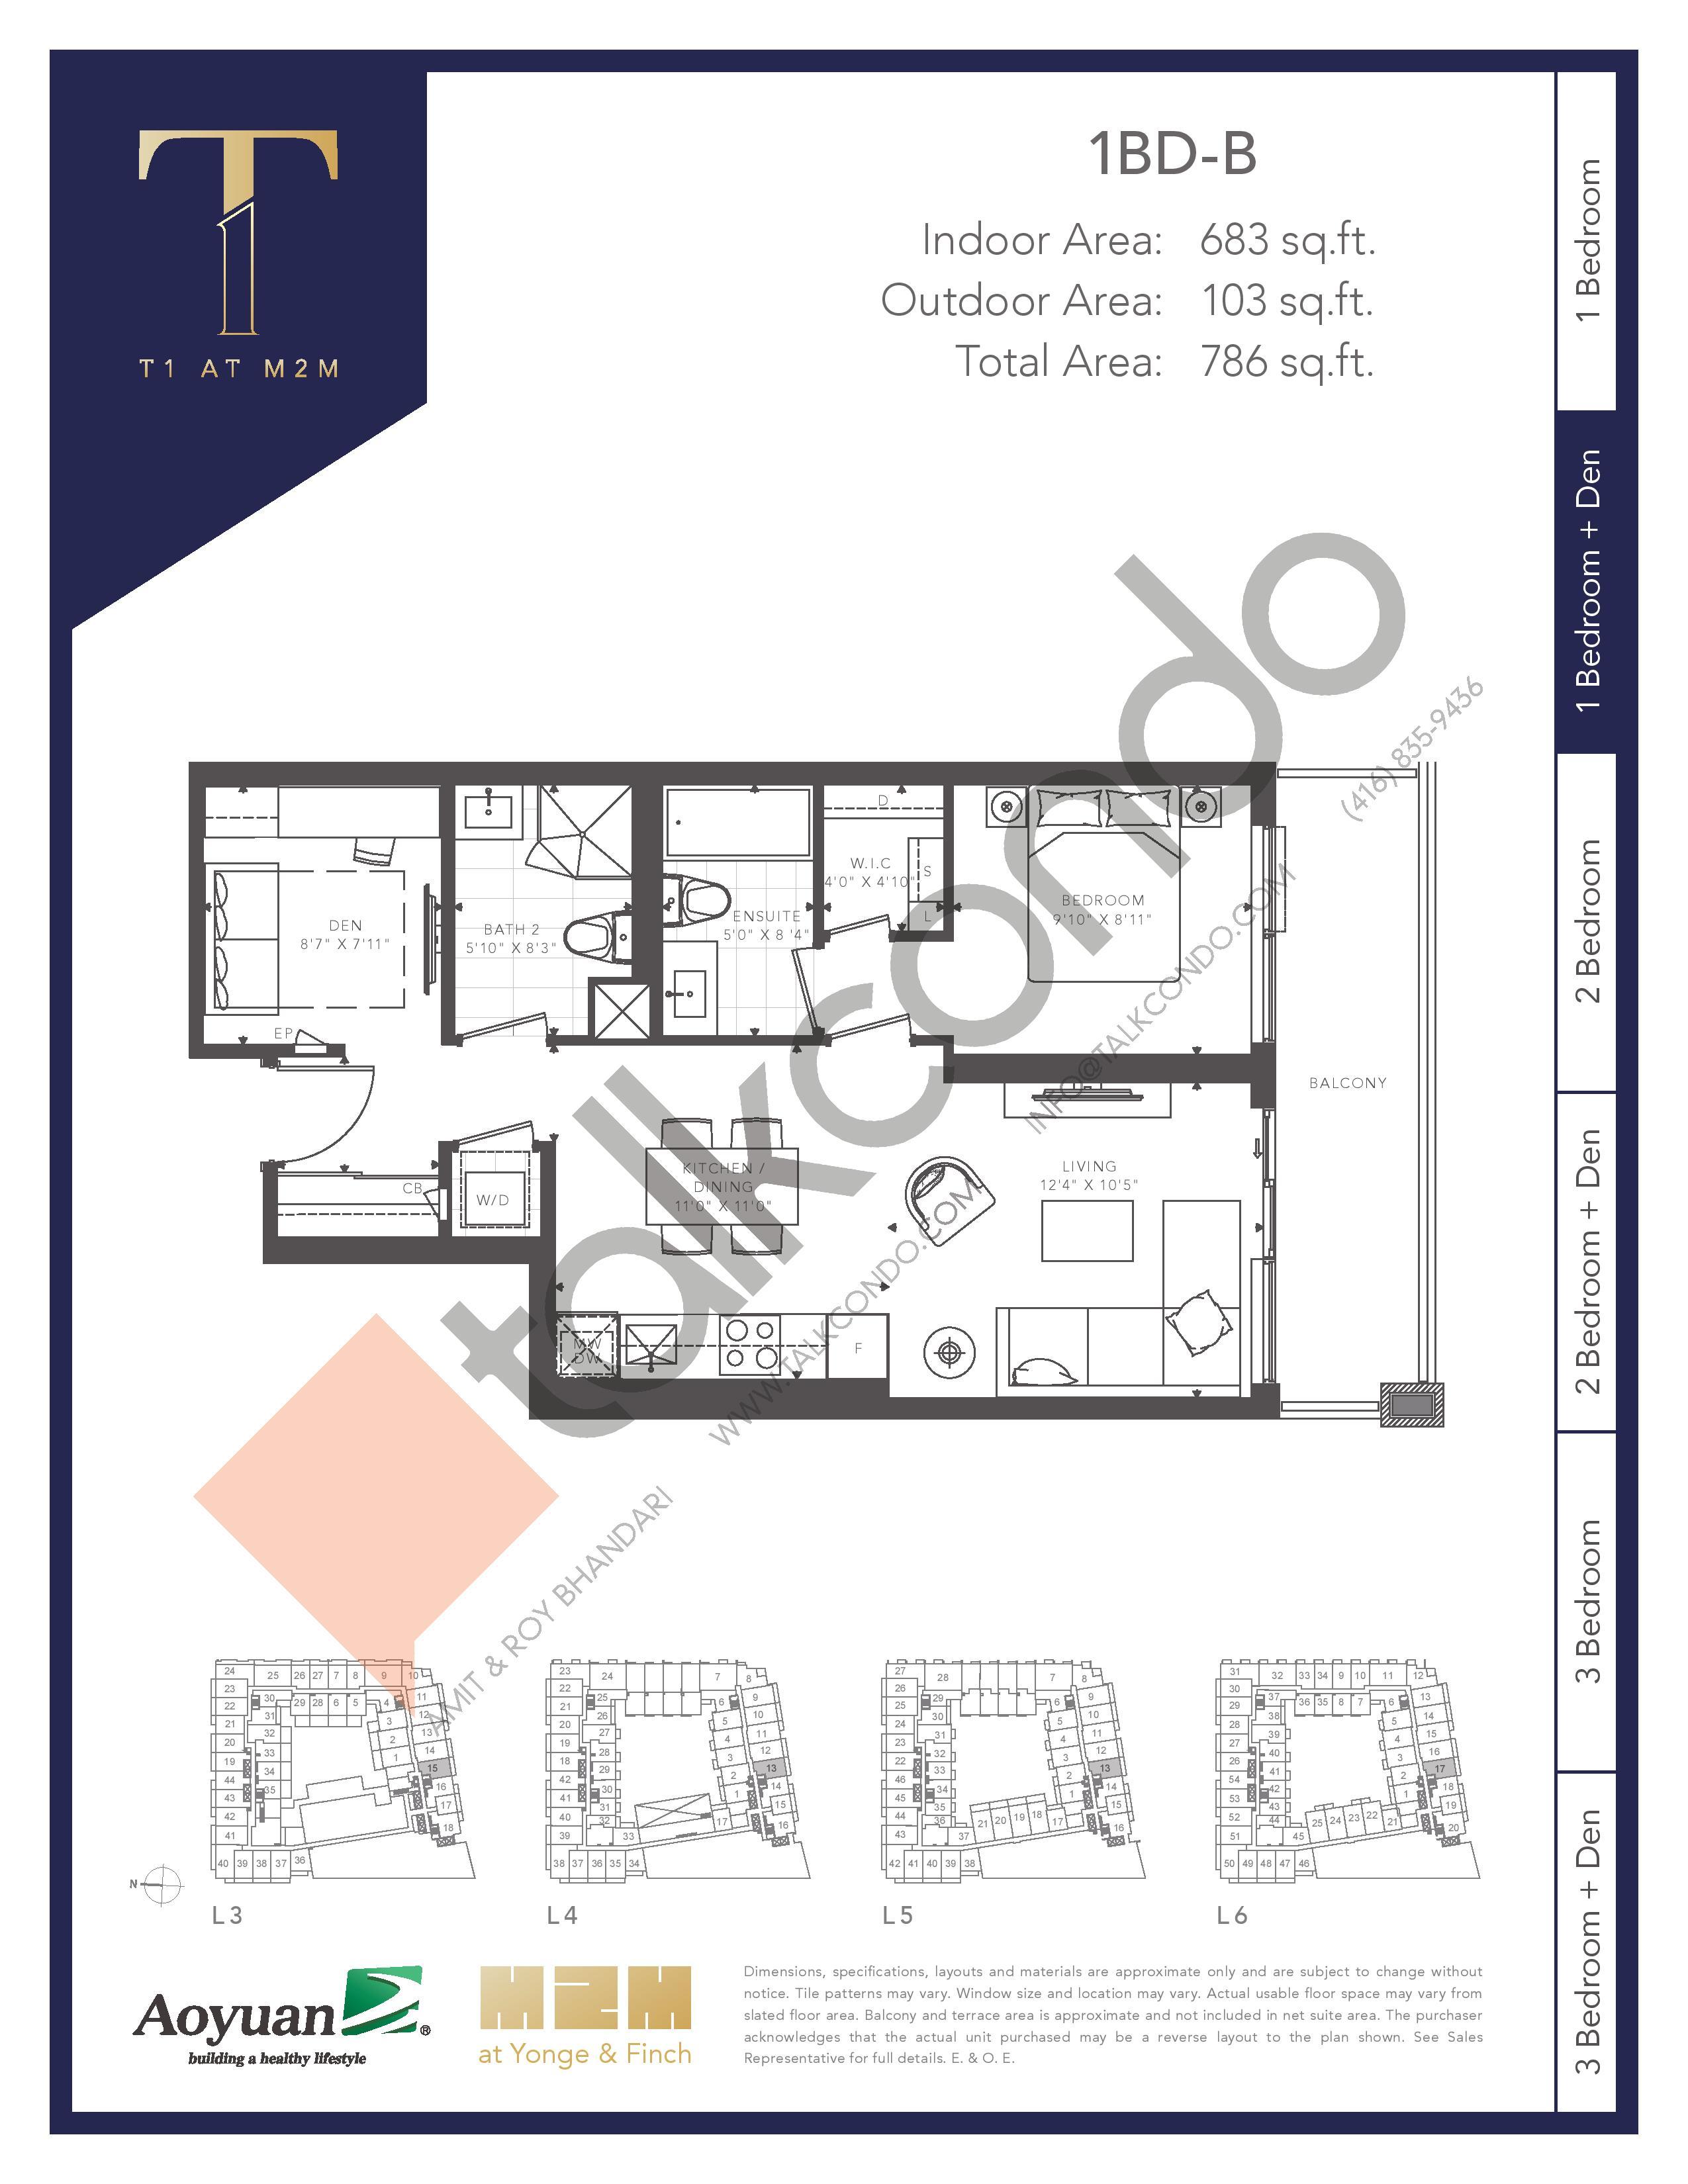 1BD-B (Tower) Floor Plan at T1 at M2M Condos - 683 sq.ft